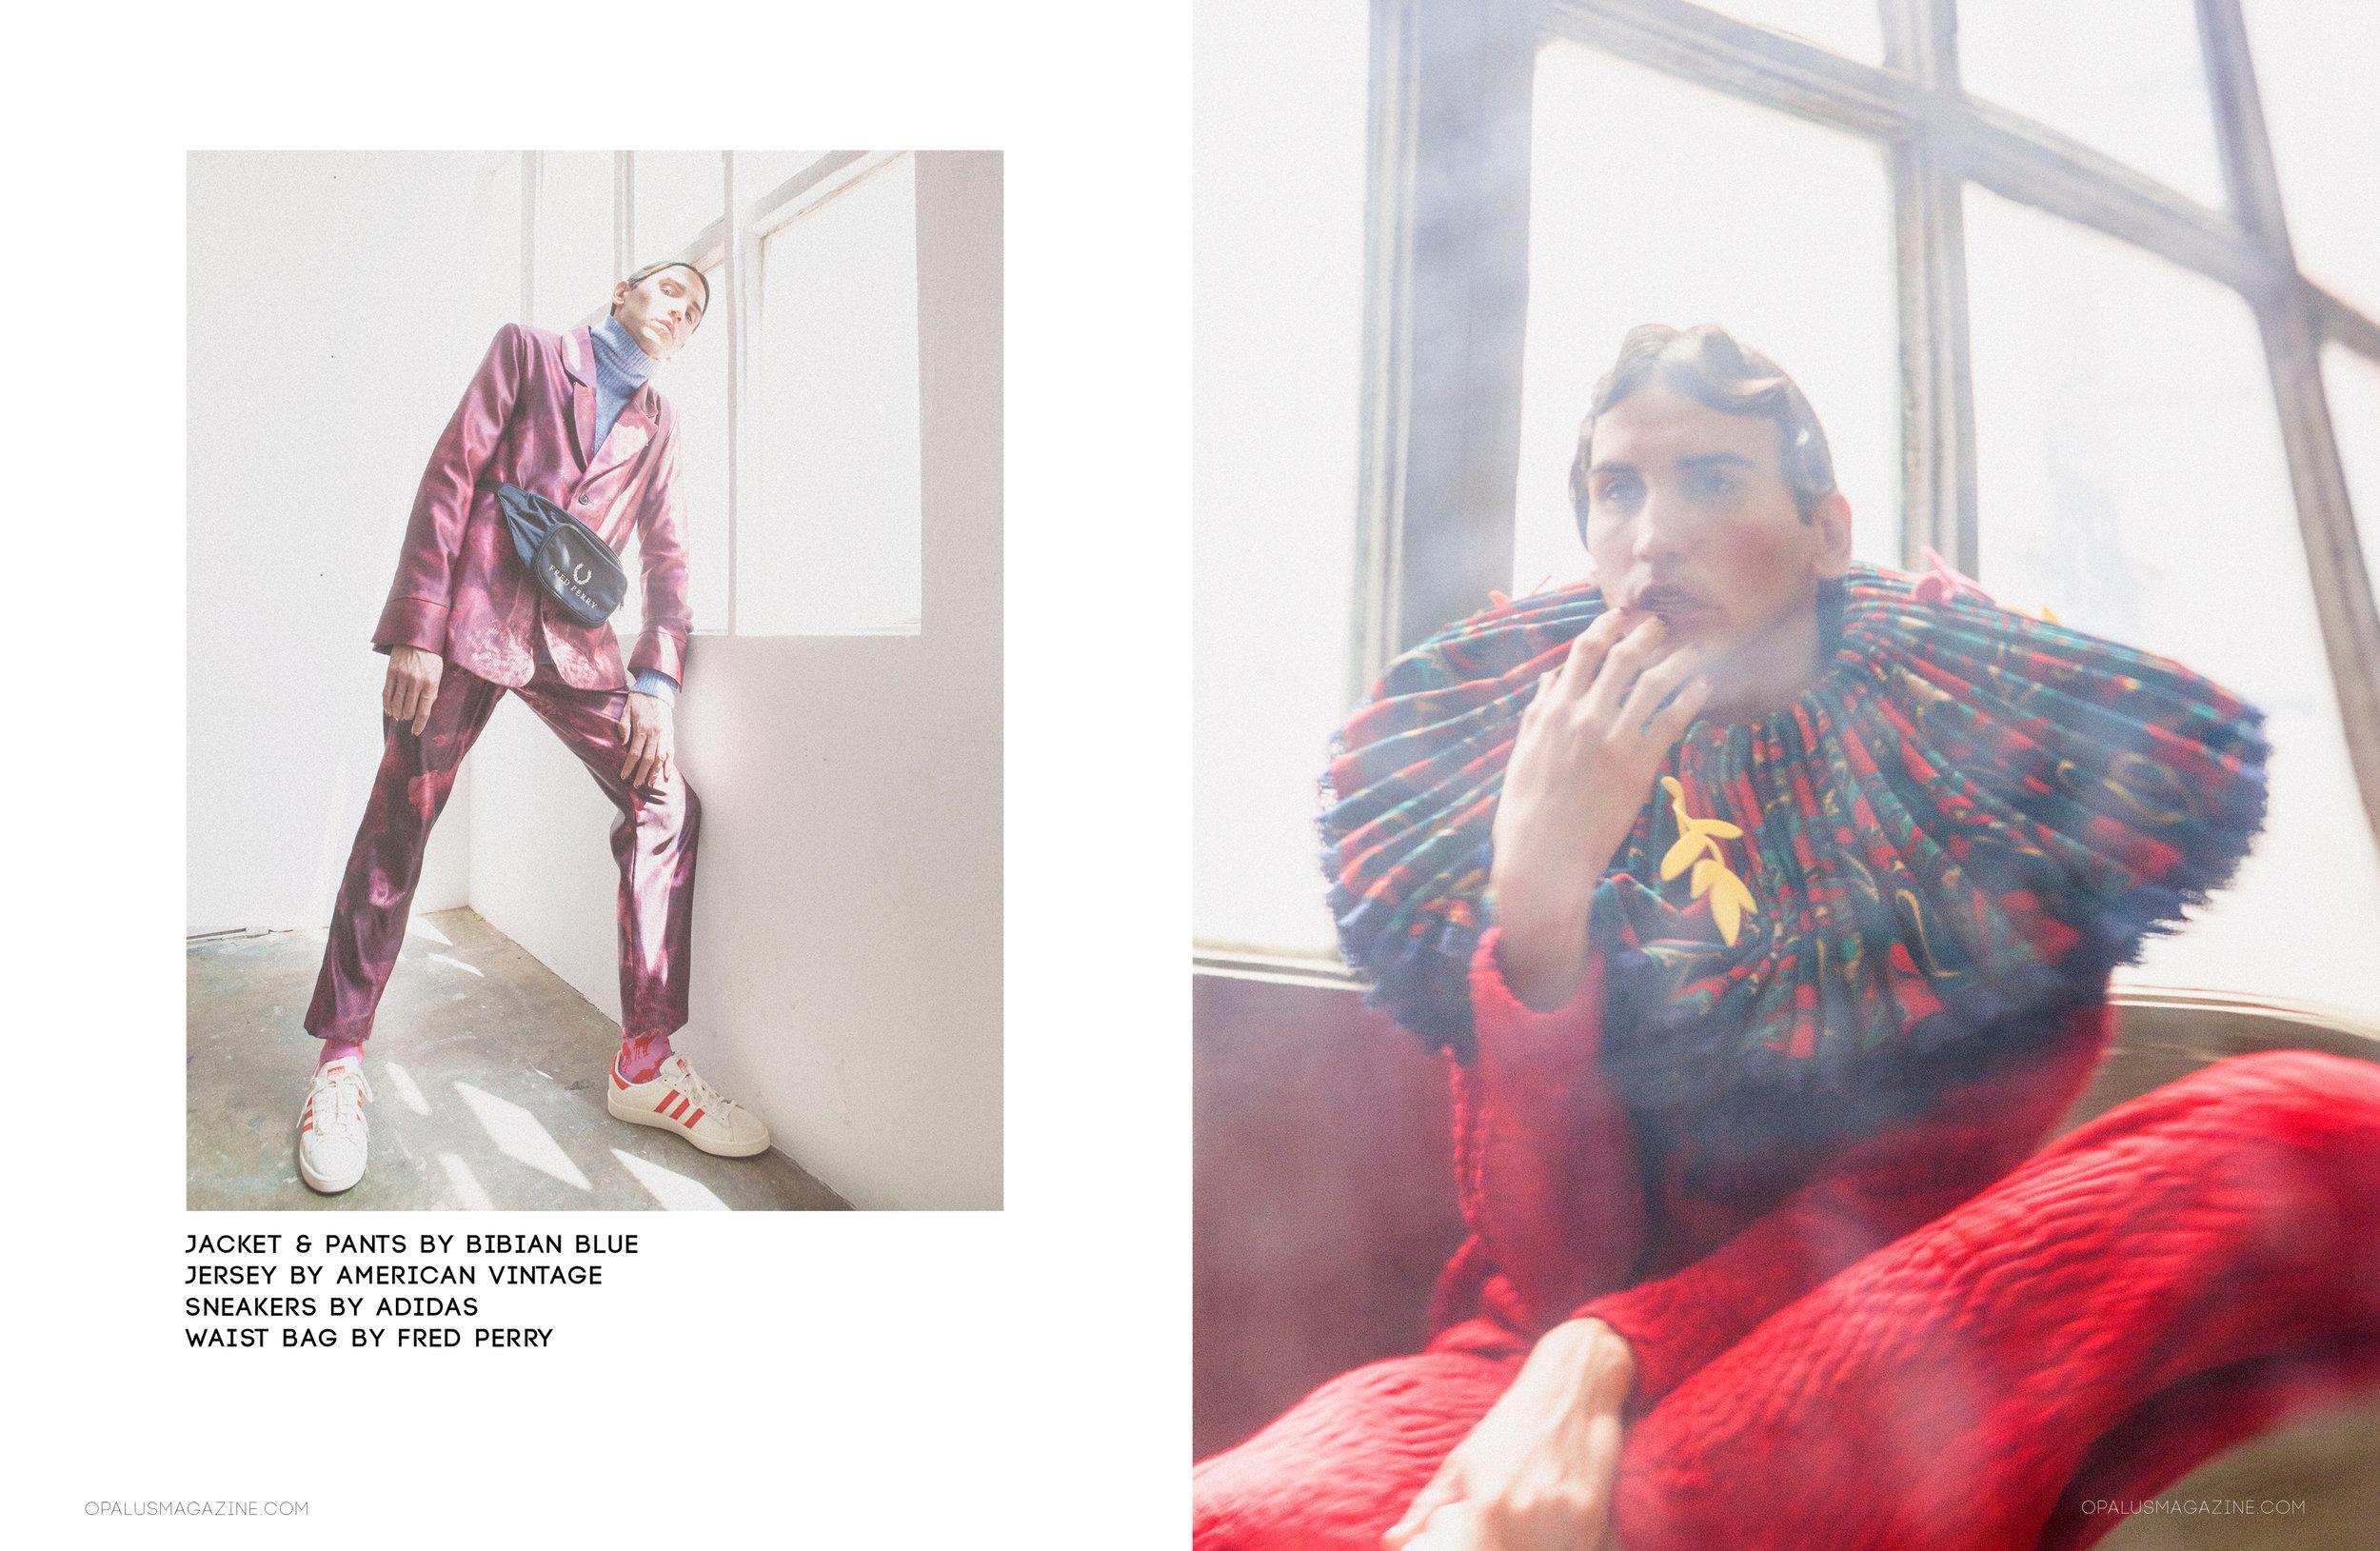 Ana_Coello_OPALUS_Magazine4.jpg